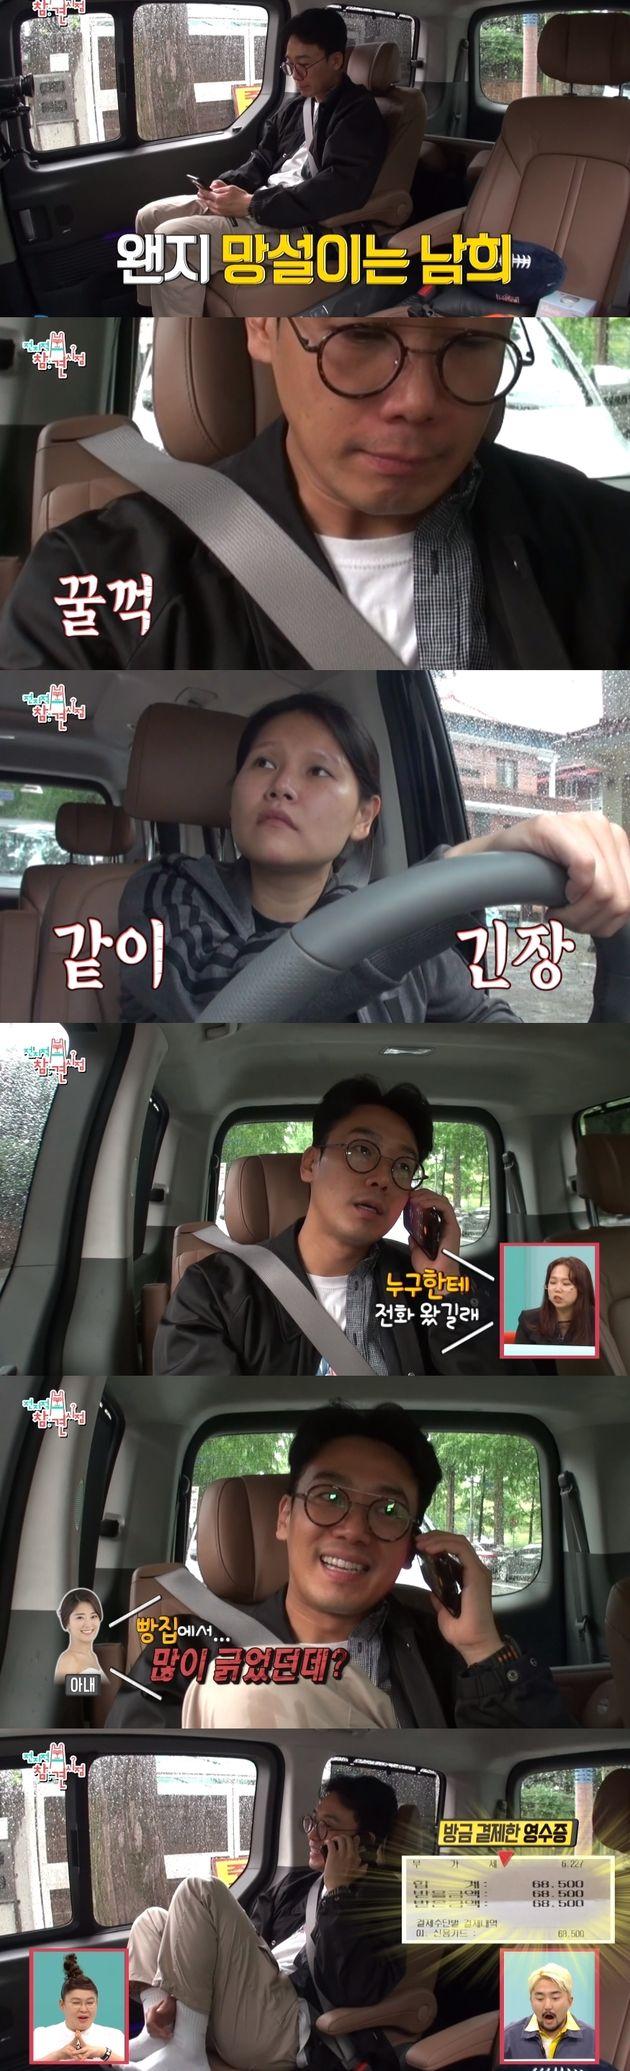 MBC 프로그램 '전지적 참견